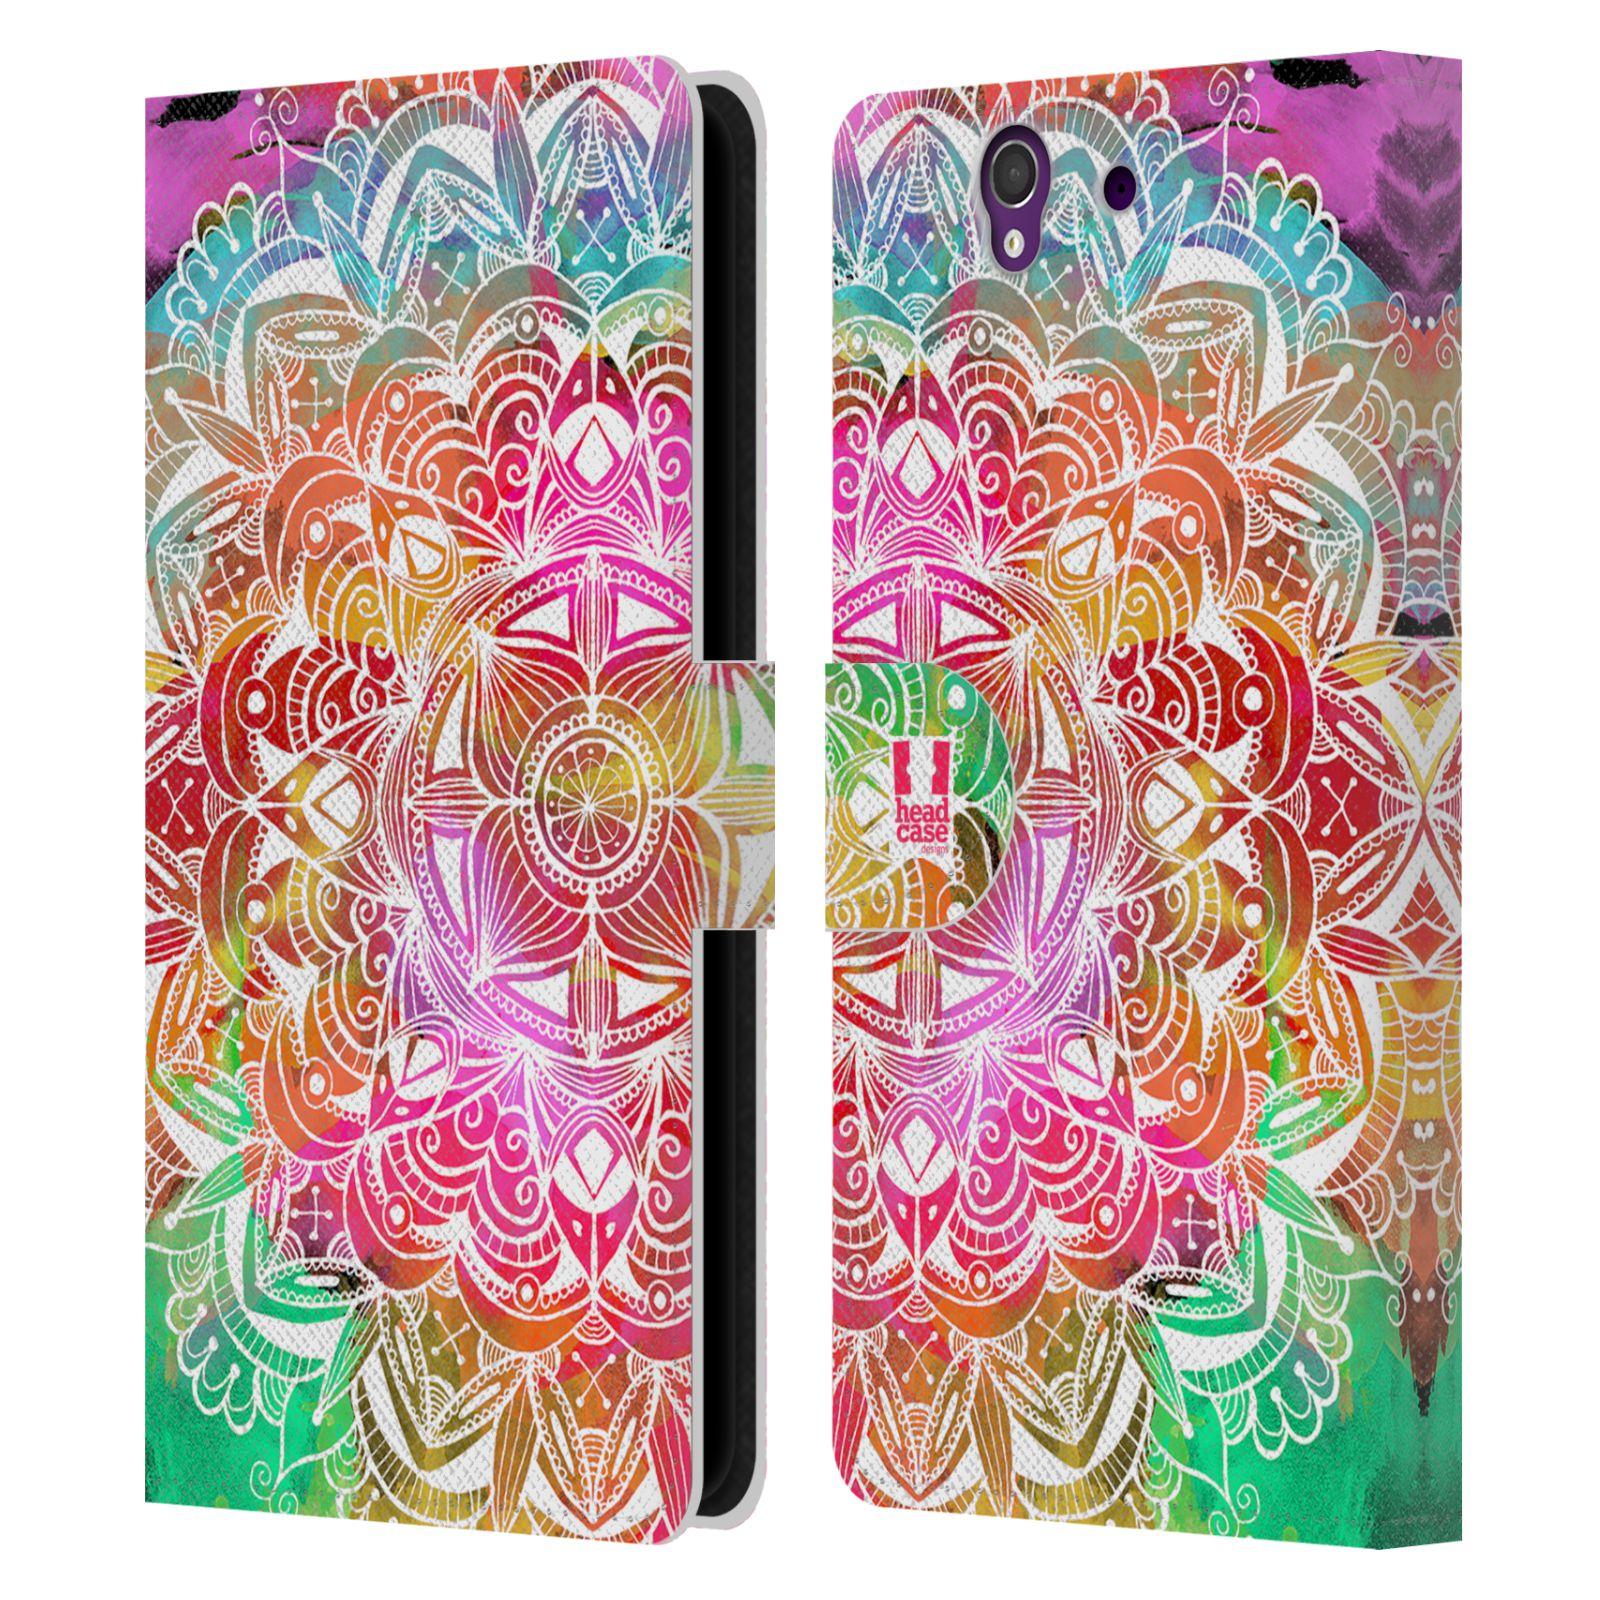 HEAD CASE Flipové pouzdro pro mobil SONY XPERIA Z (C6603) mandala kreslená duha